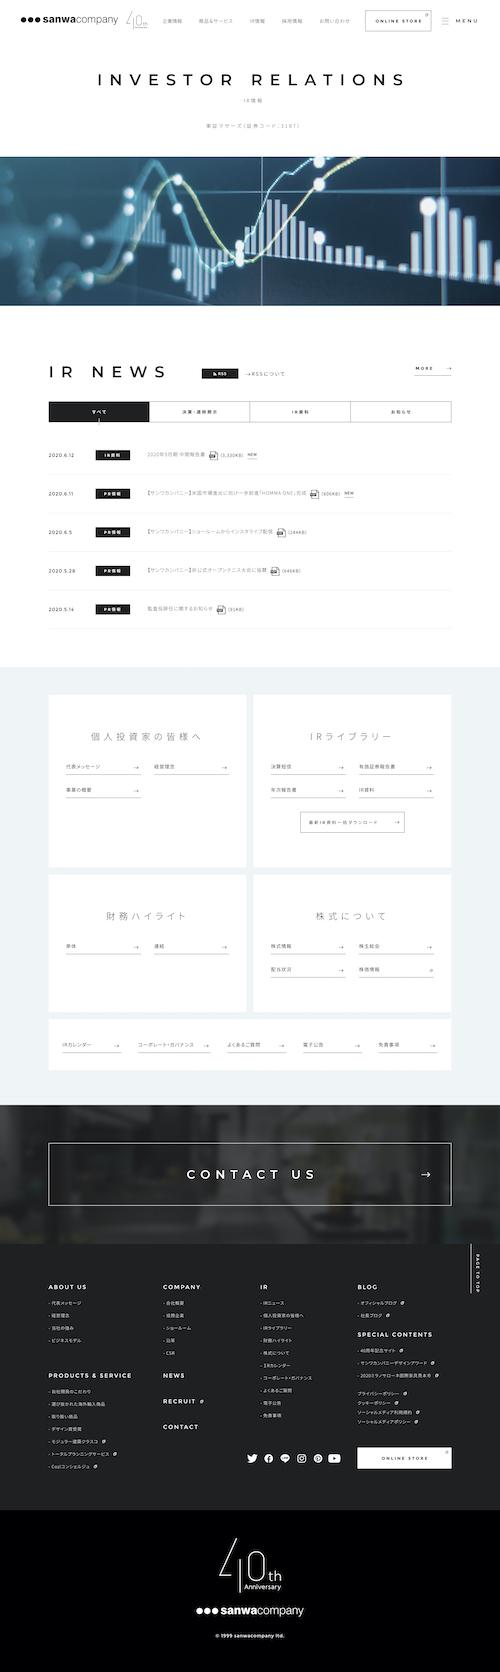 info-sanwacompany-ir